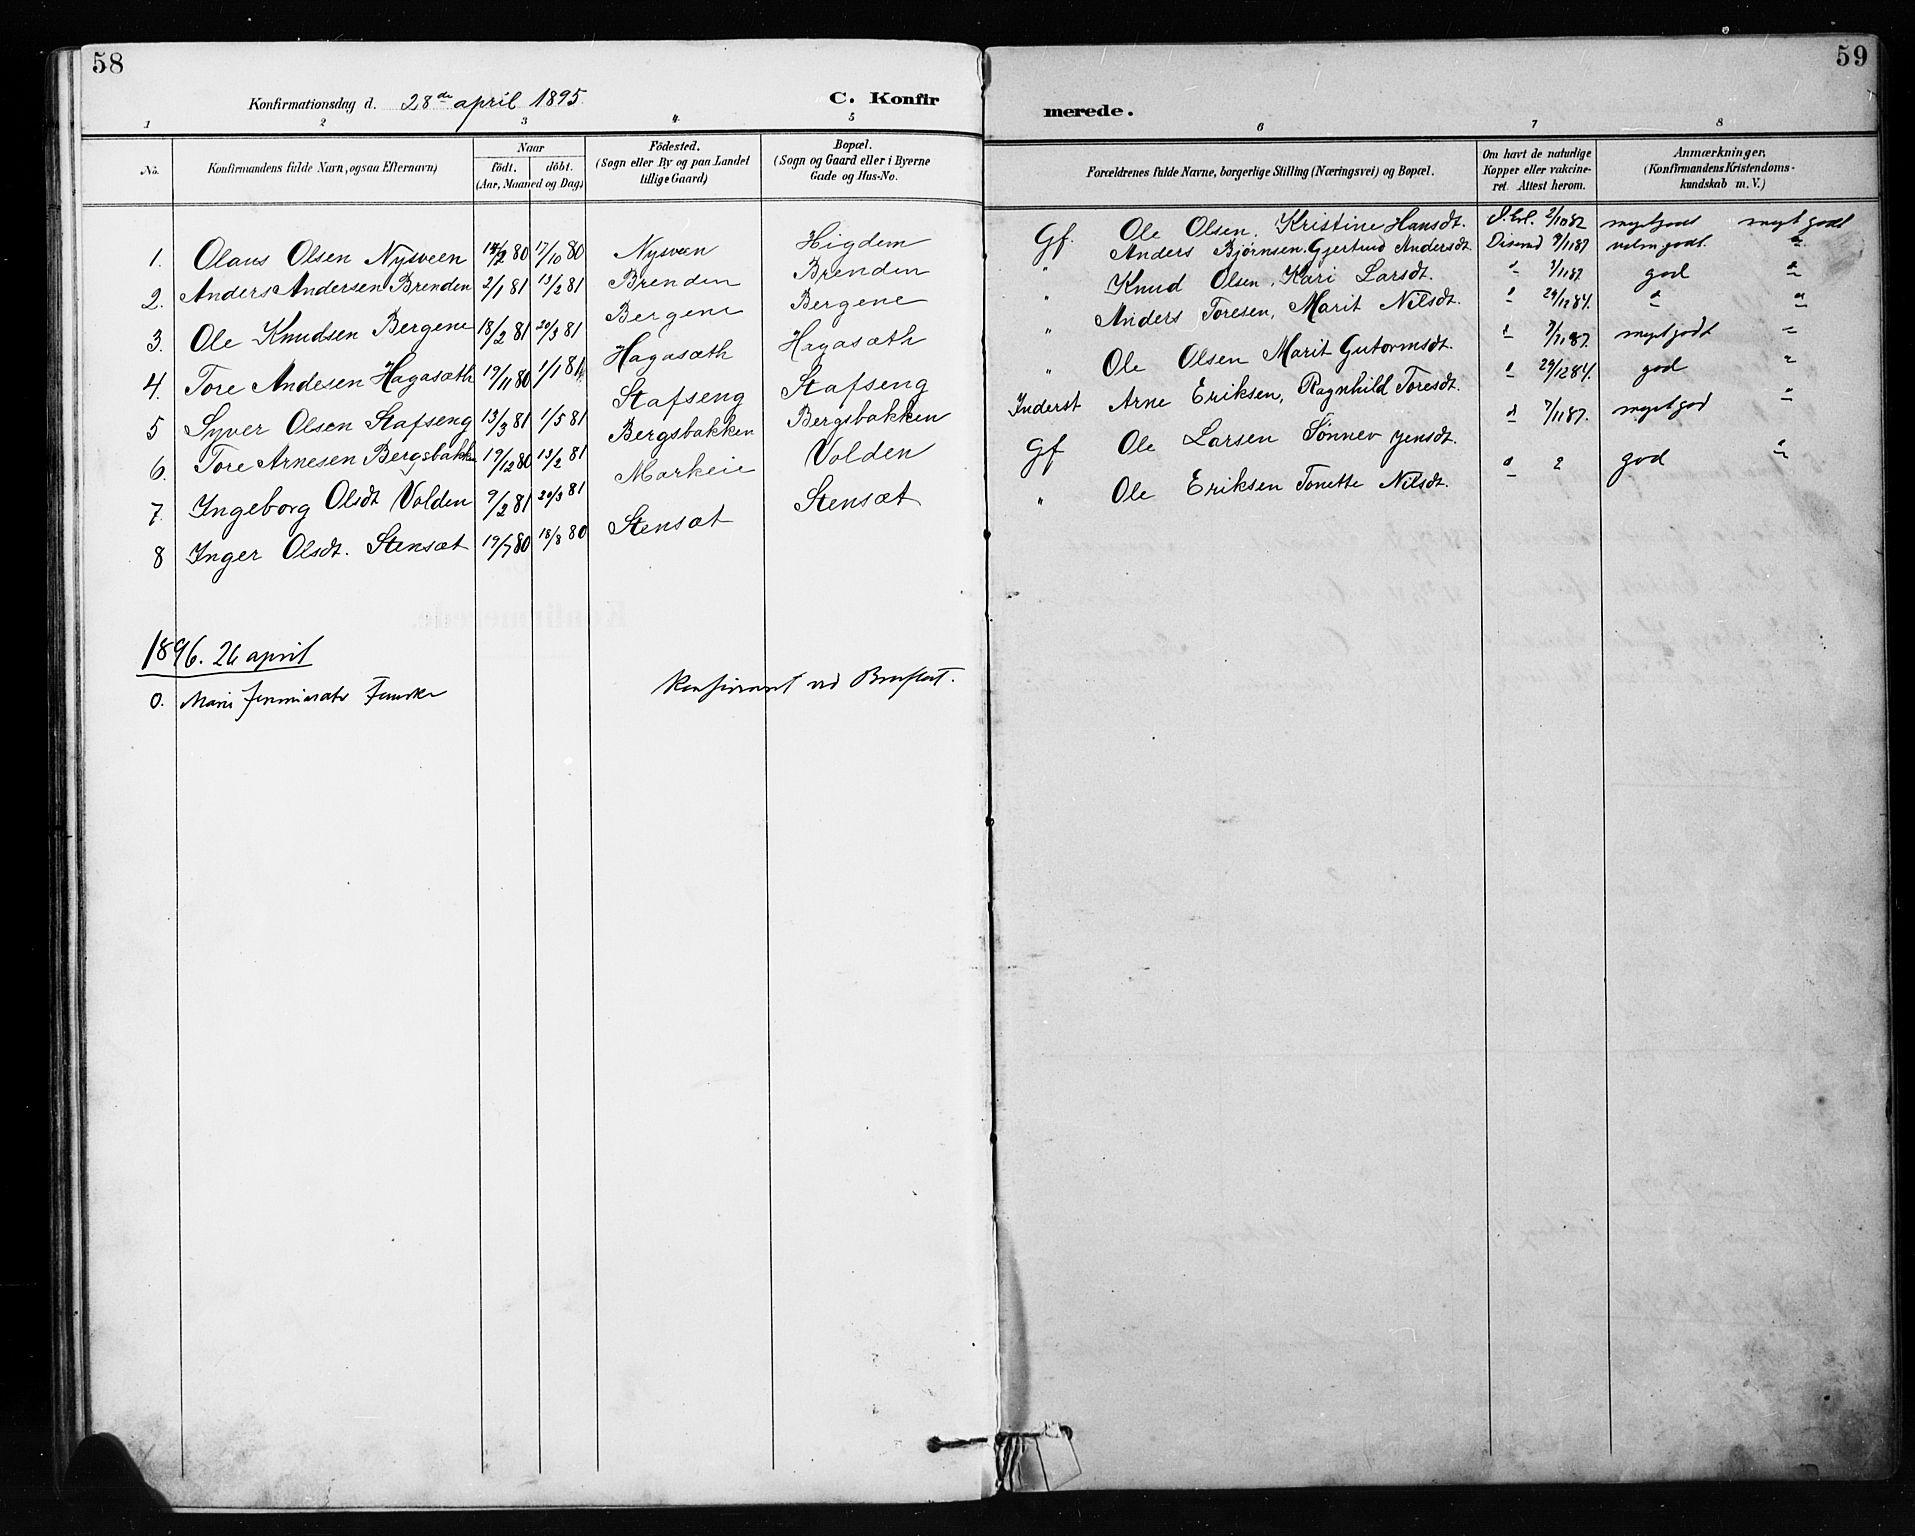 SAH, Etnedal prestekontor, H/Ha/Hab/Habb/L0001: Klokkerbok nr. II 1, 1894-1911, s. 58-59